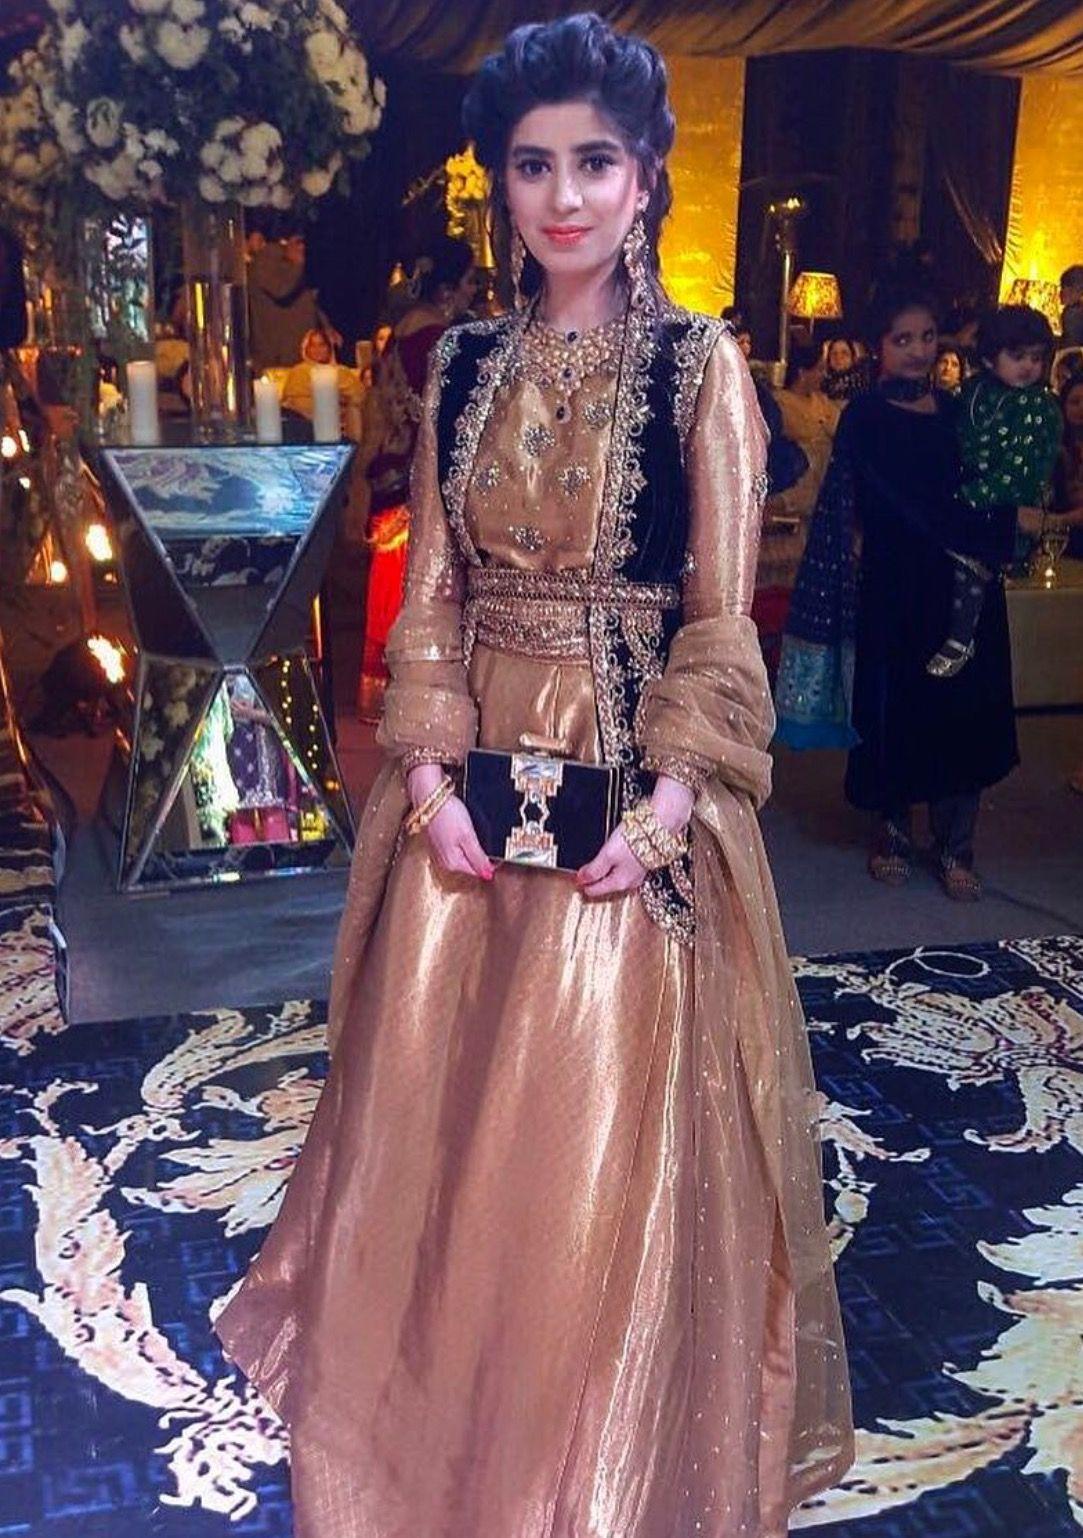 Pin von Haya B auf Pakistani Outfits | Pinterest